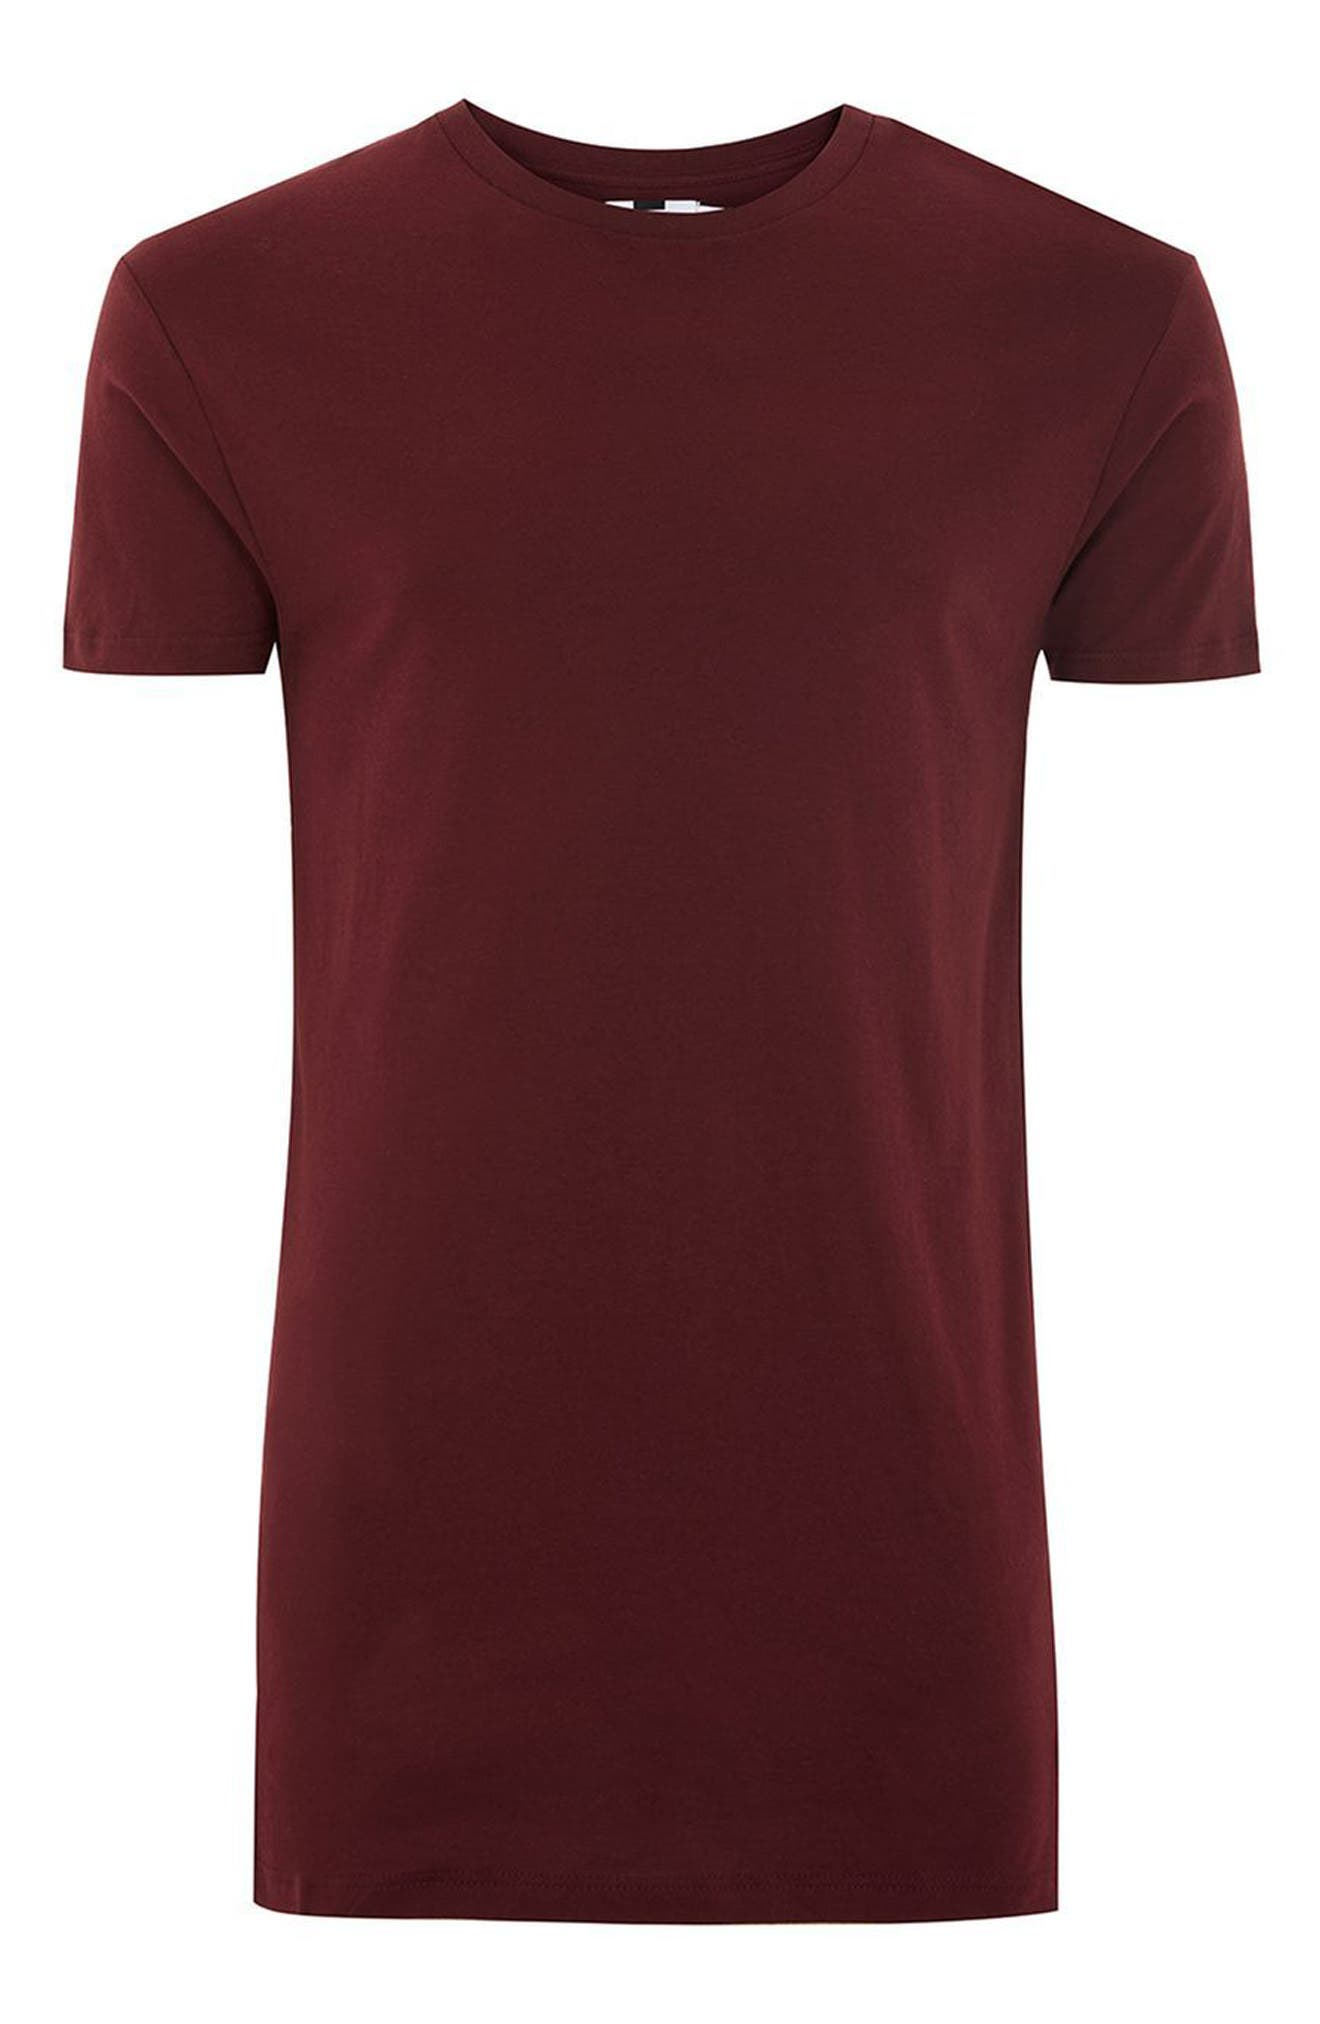 Muscle Fit Longline T-Shirt,                             Alternate thumbnail 4, color,                             930